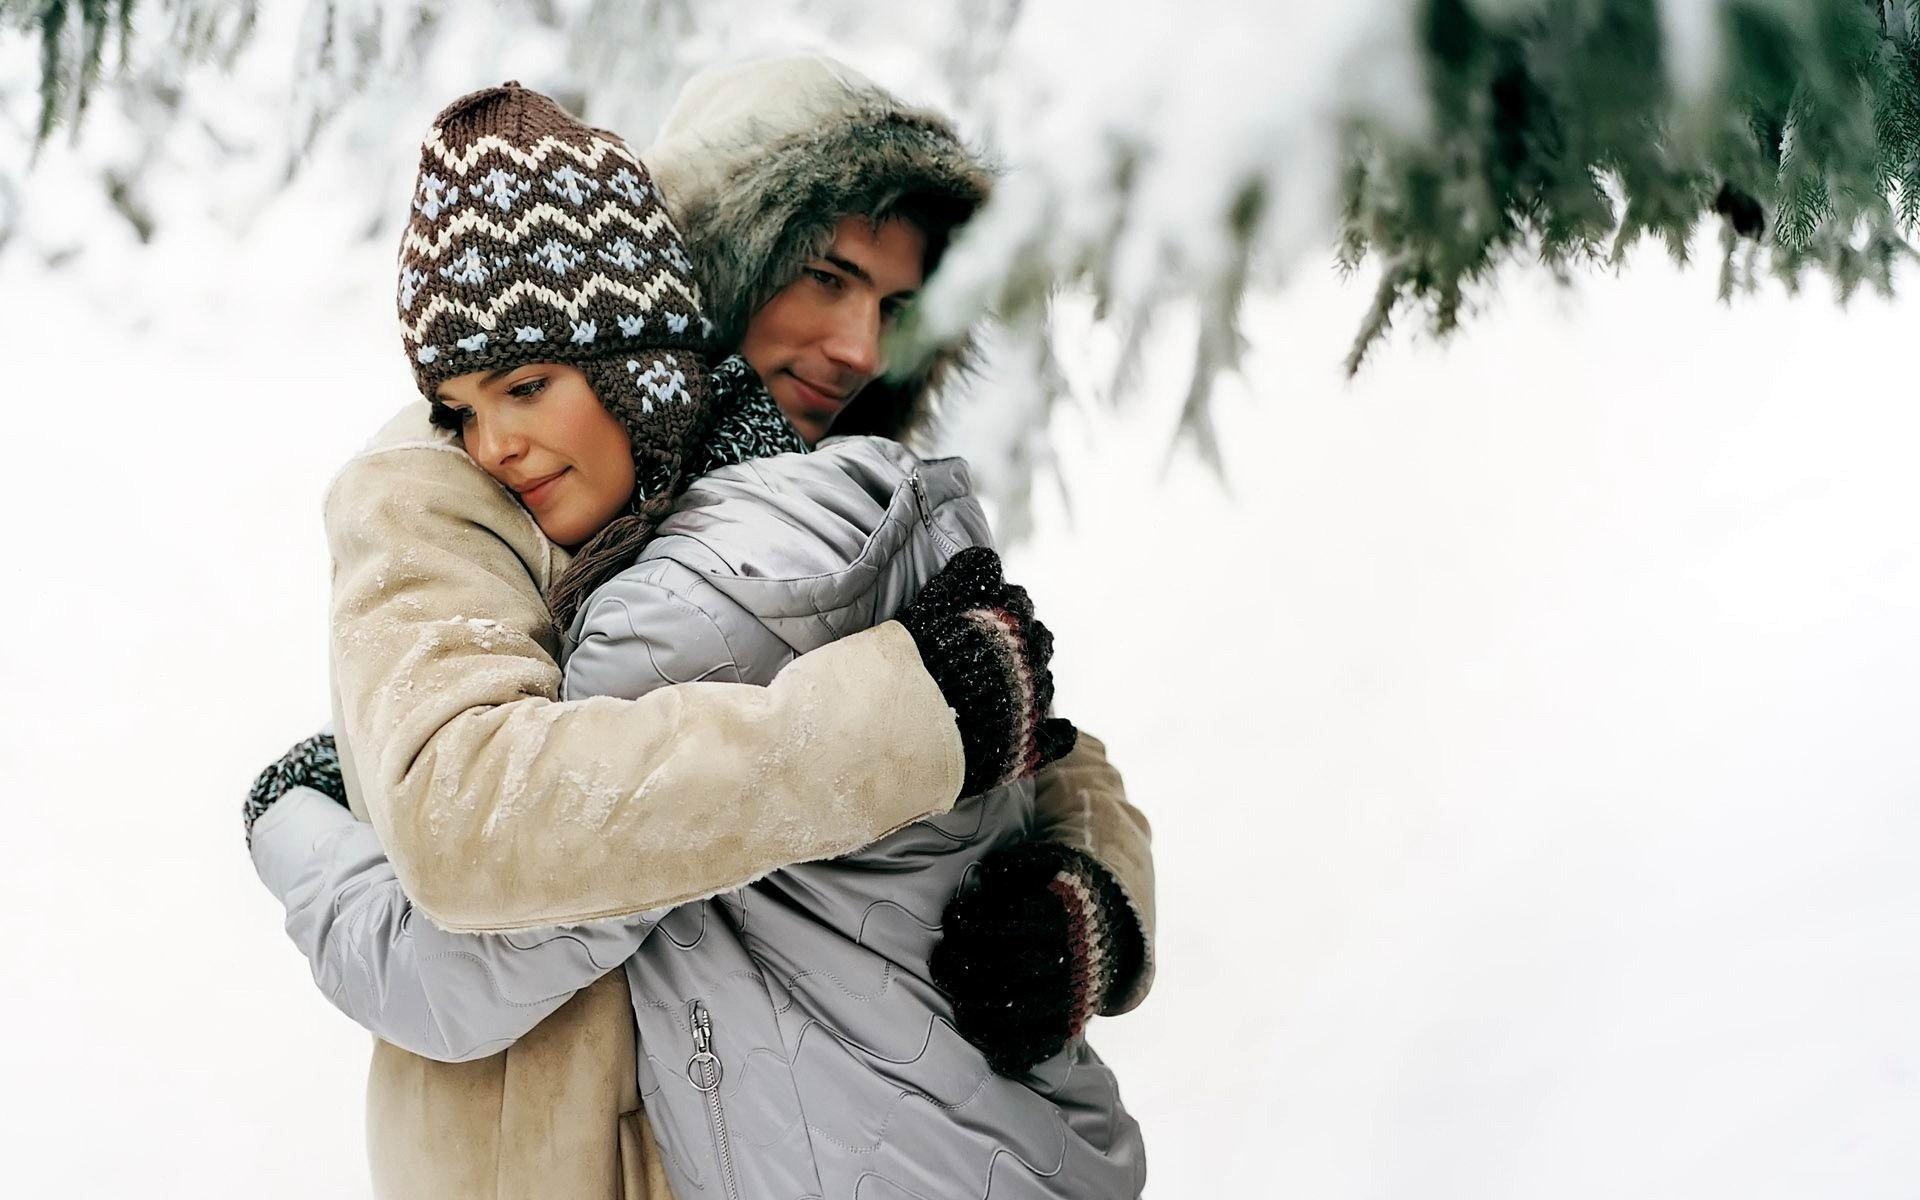 Beautiful Wallpaper Mobile Hug - 1462646163-winter-snow-steam-love-couple-file  Collection_526183.jpg